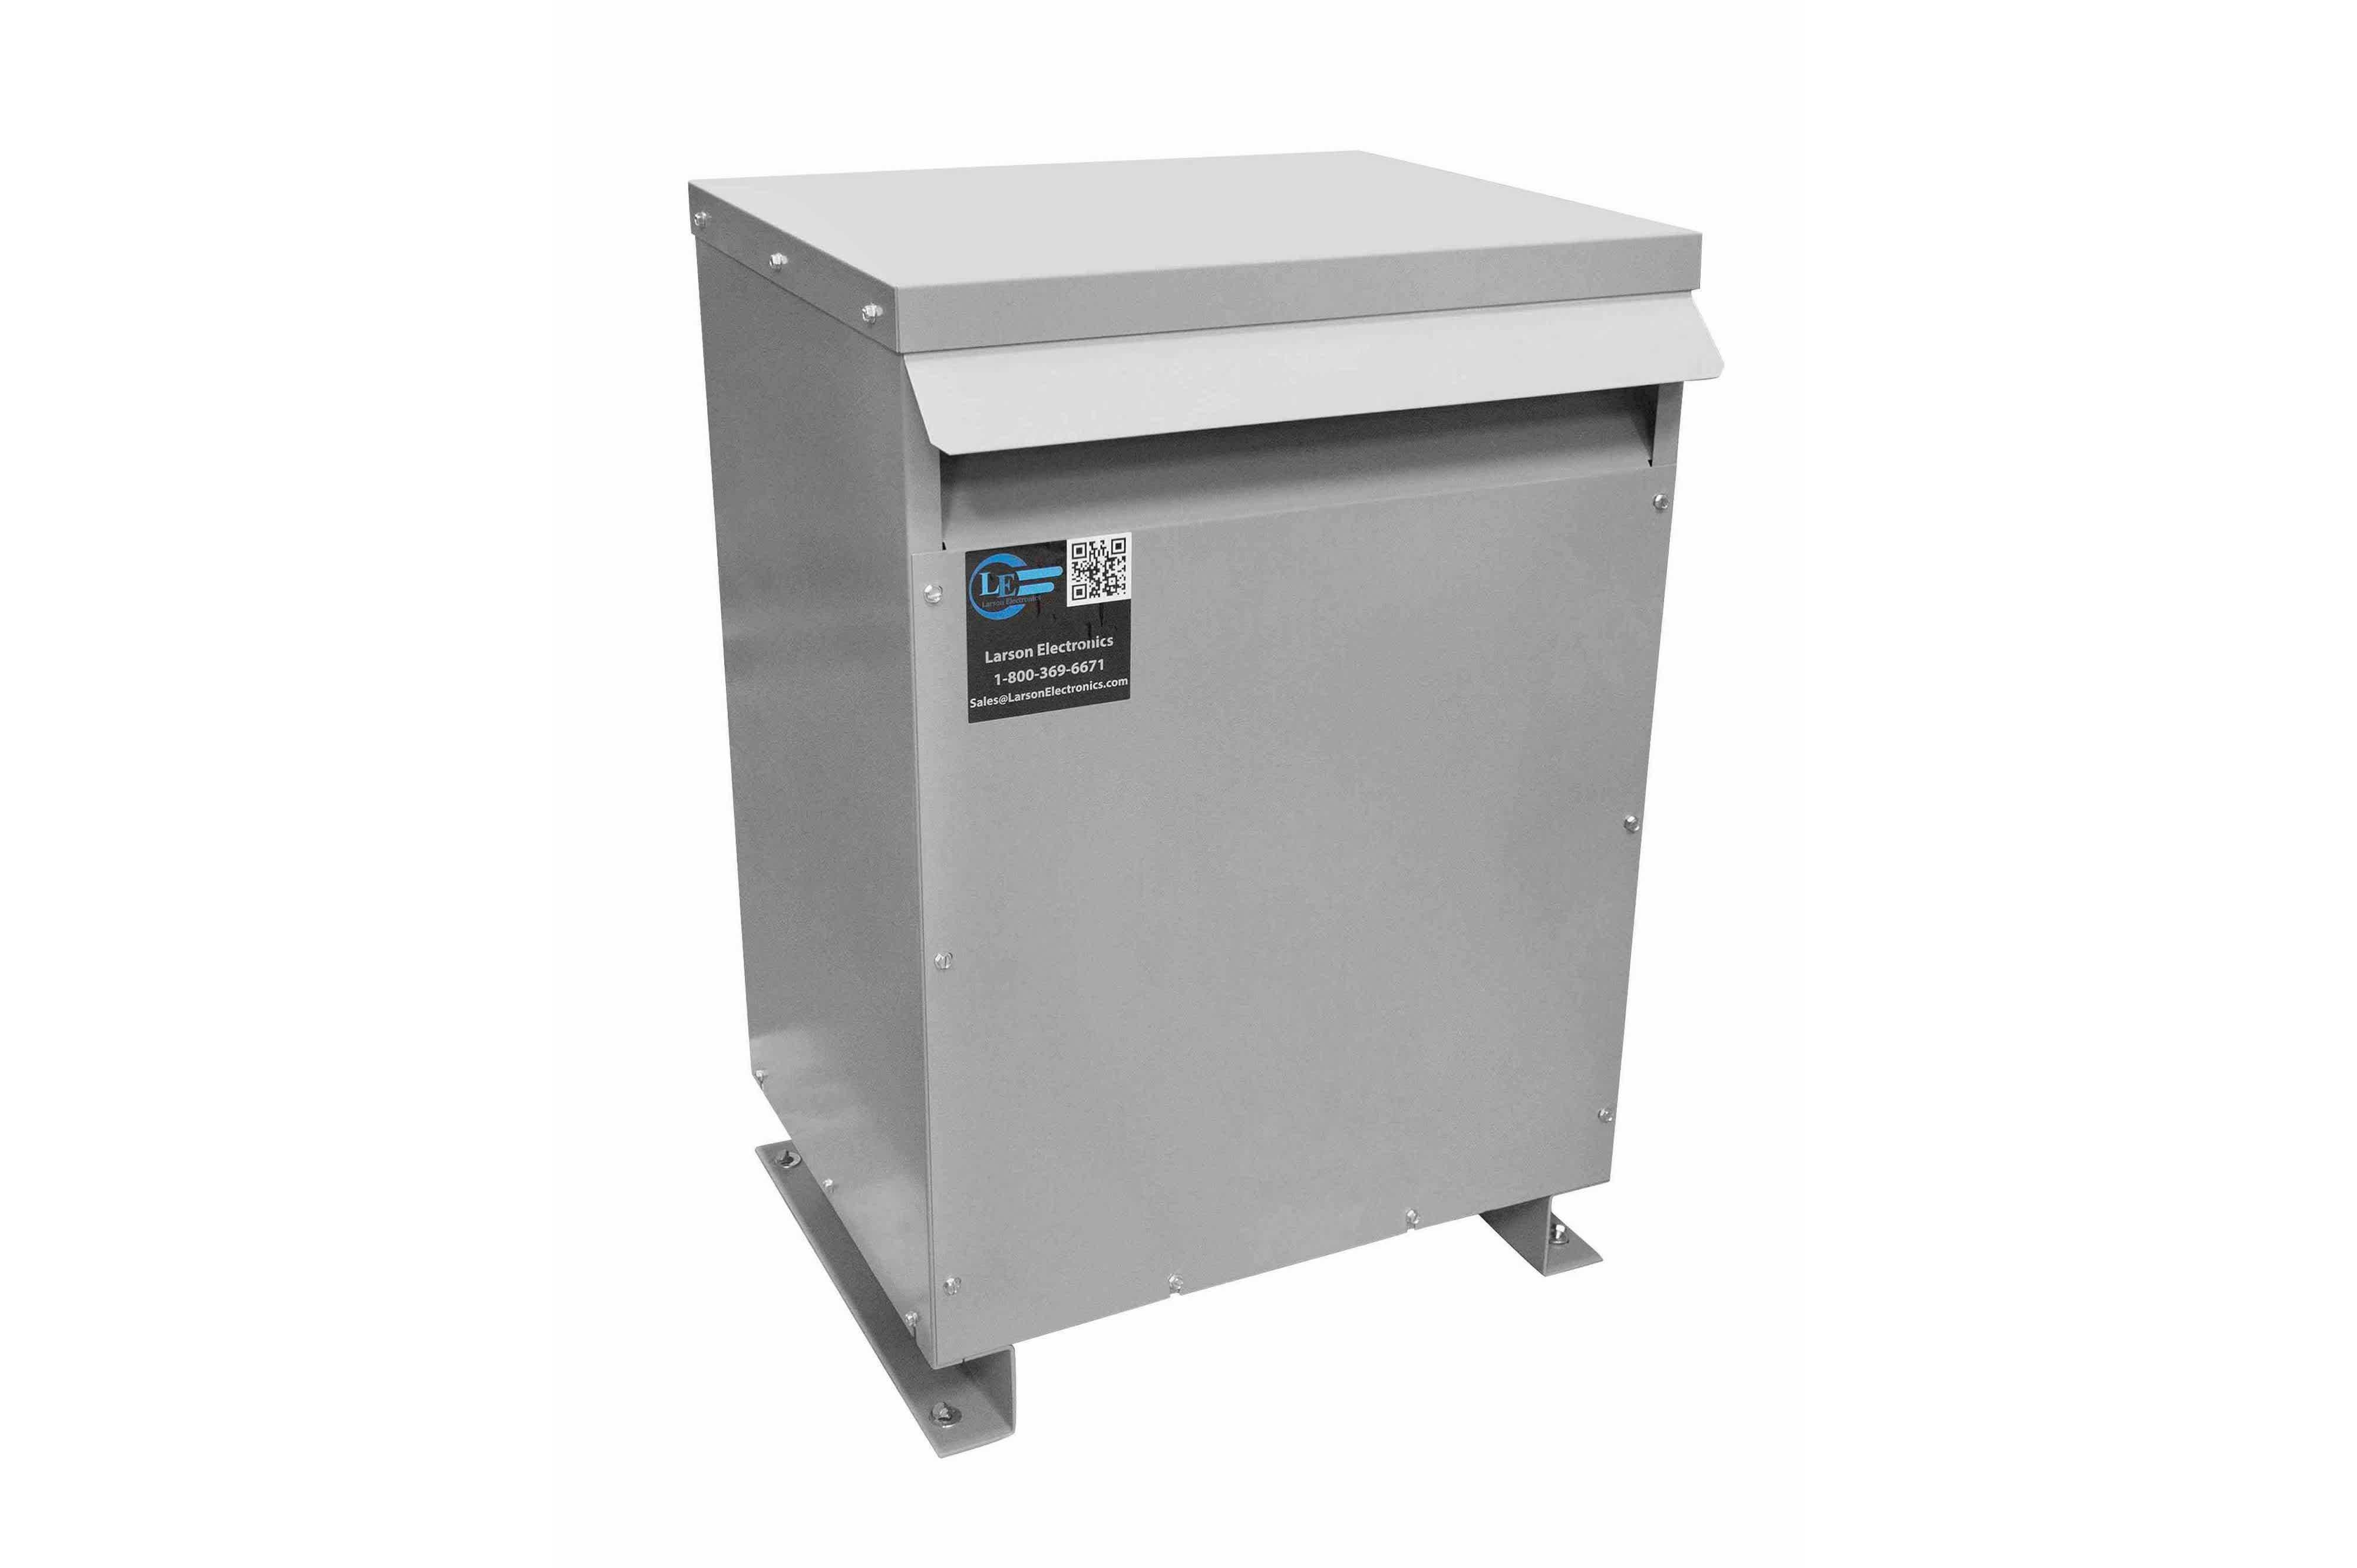 300 kVA 3PH DOE Transformer, 240V Delta Primary, 415Y/240 Wye-N Secondary, N3R, Ventilated, 60 Hz